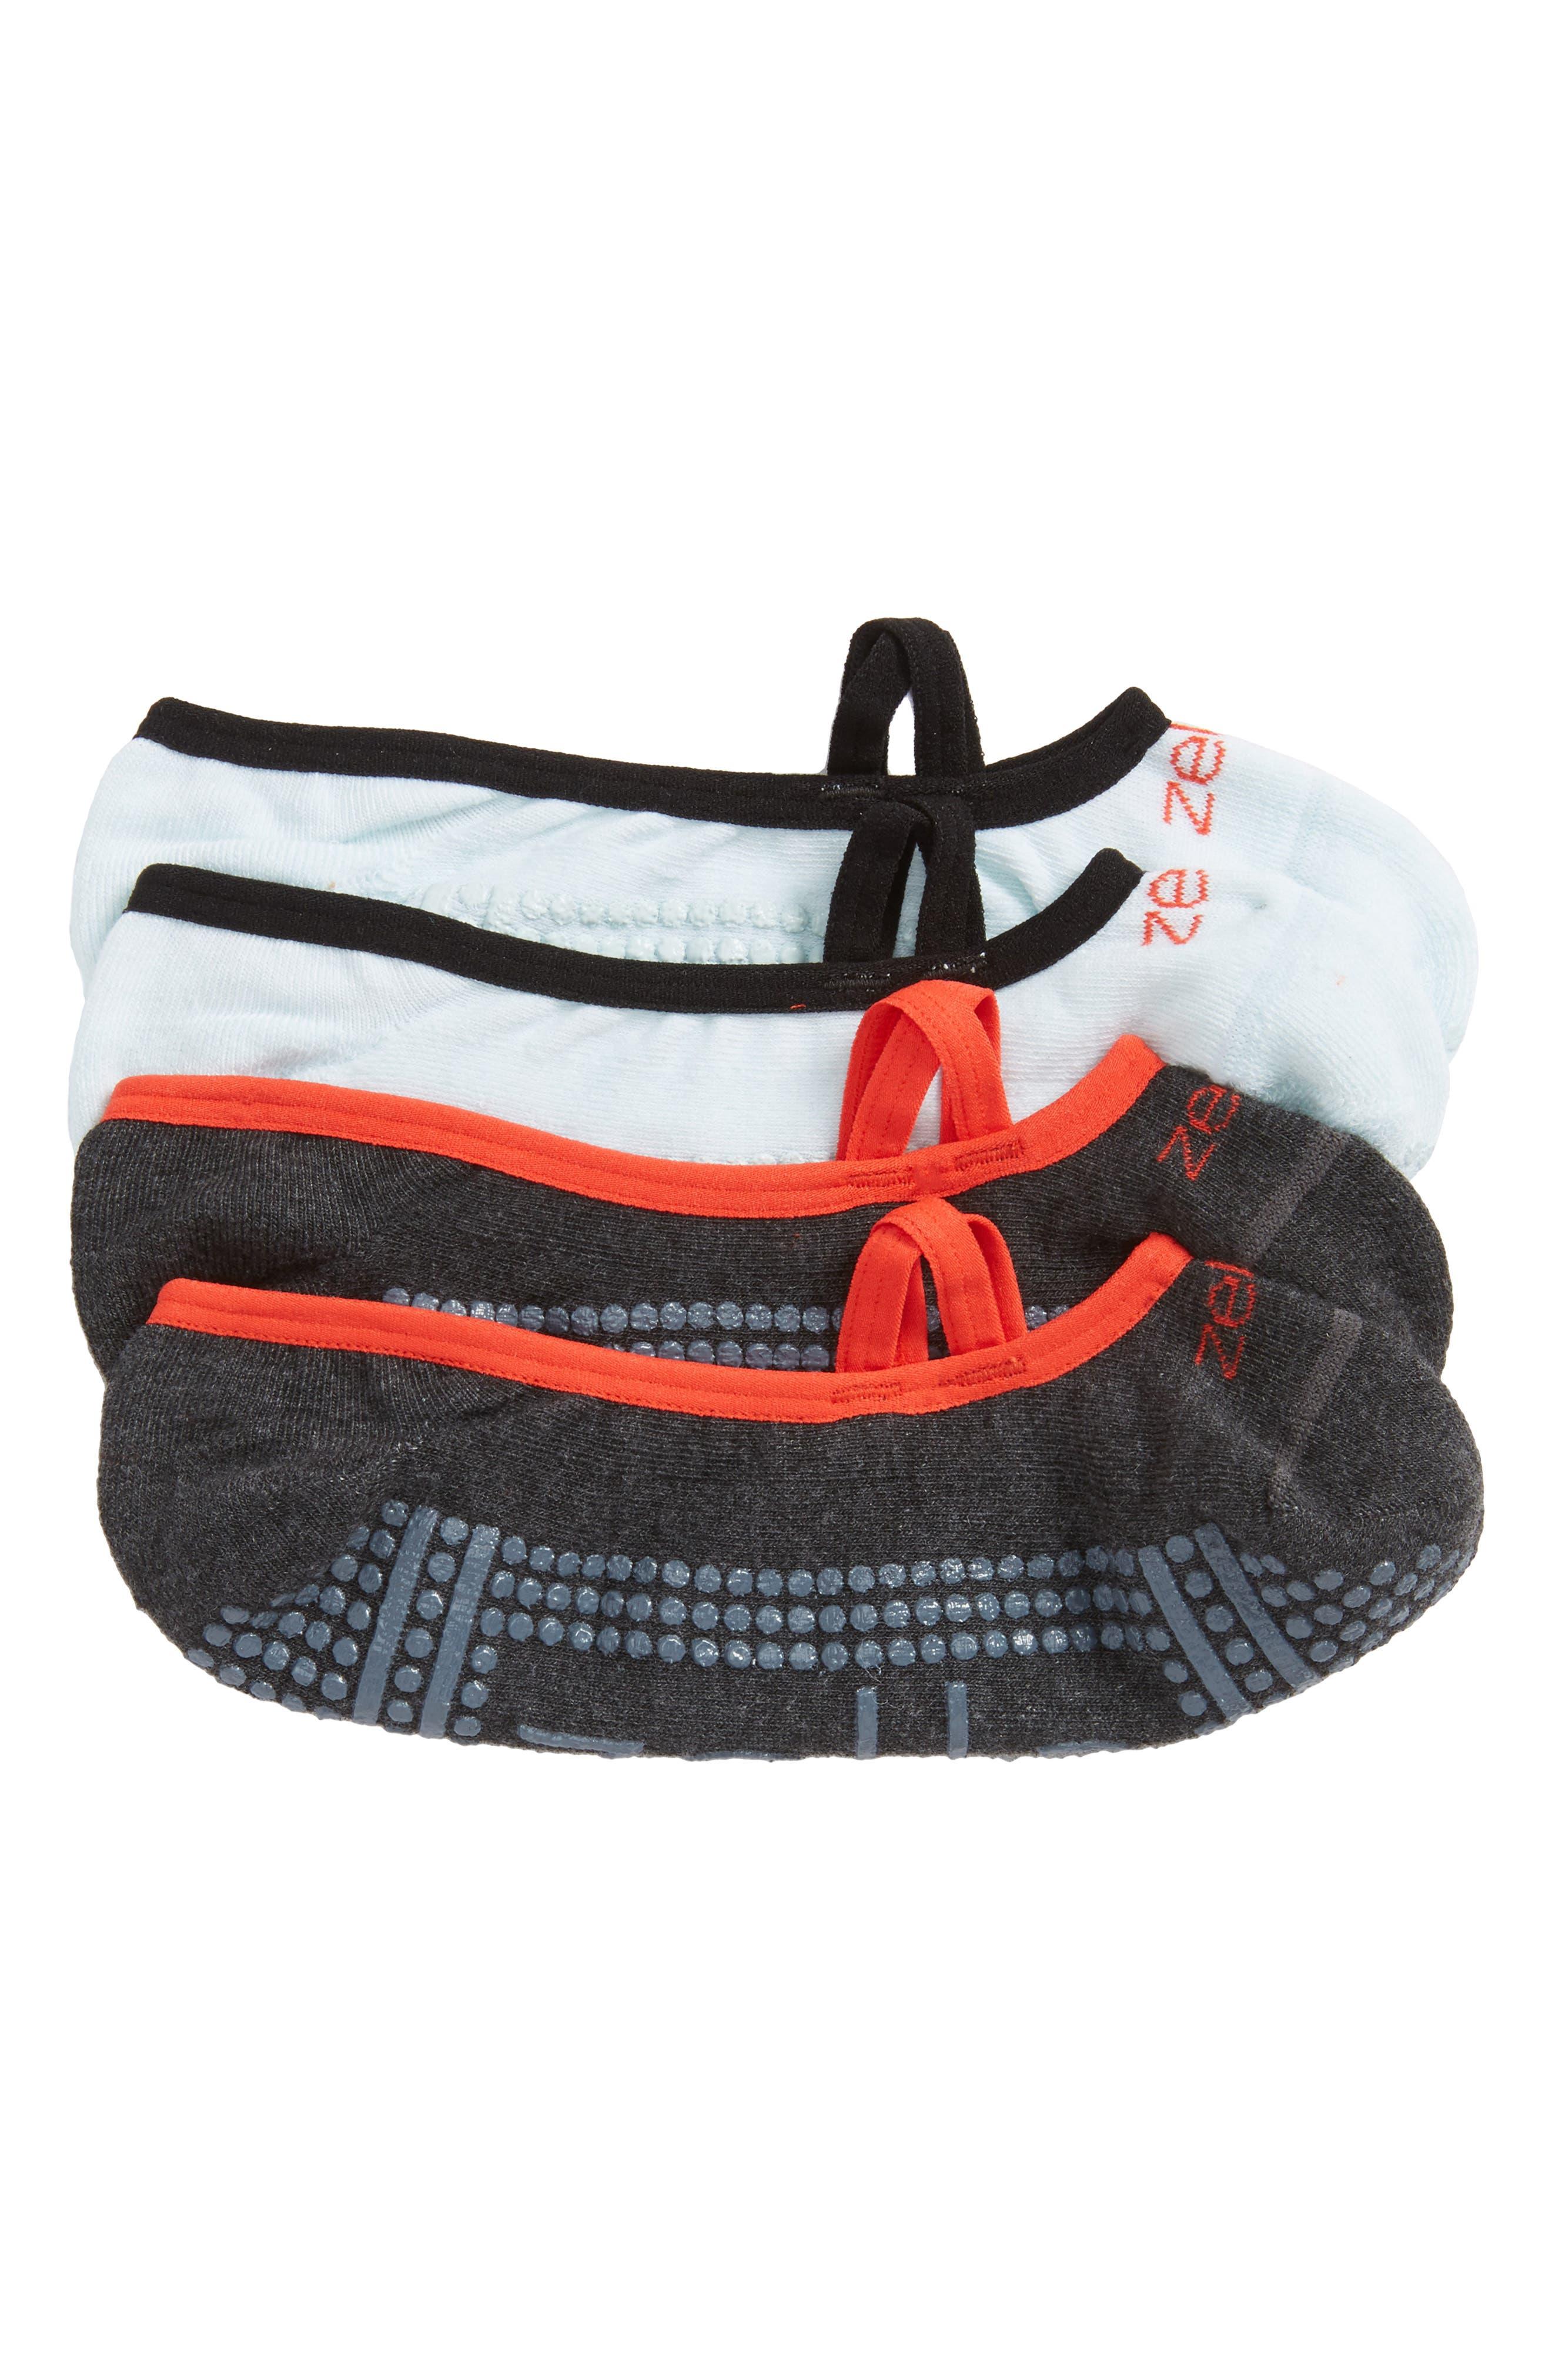 Alternate Image 1 Selected - Zella Studio Ankle Socks (2-Pack)